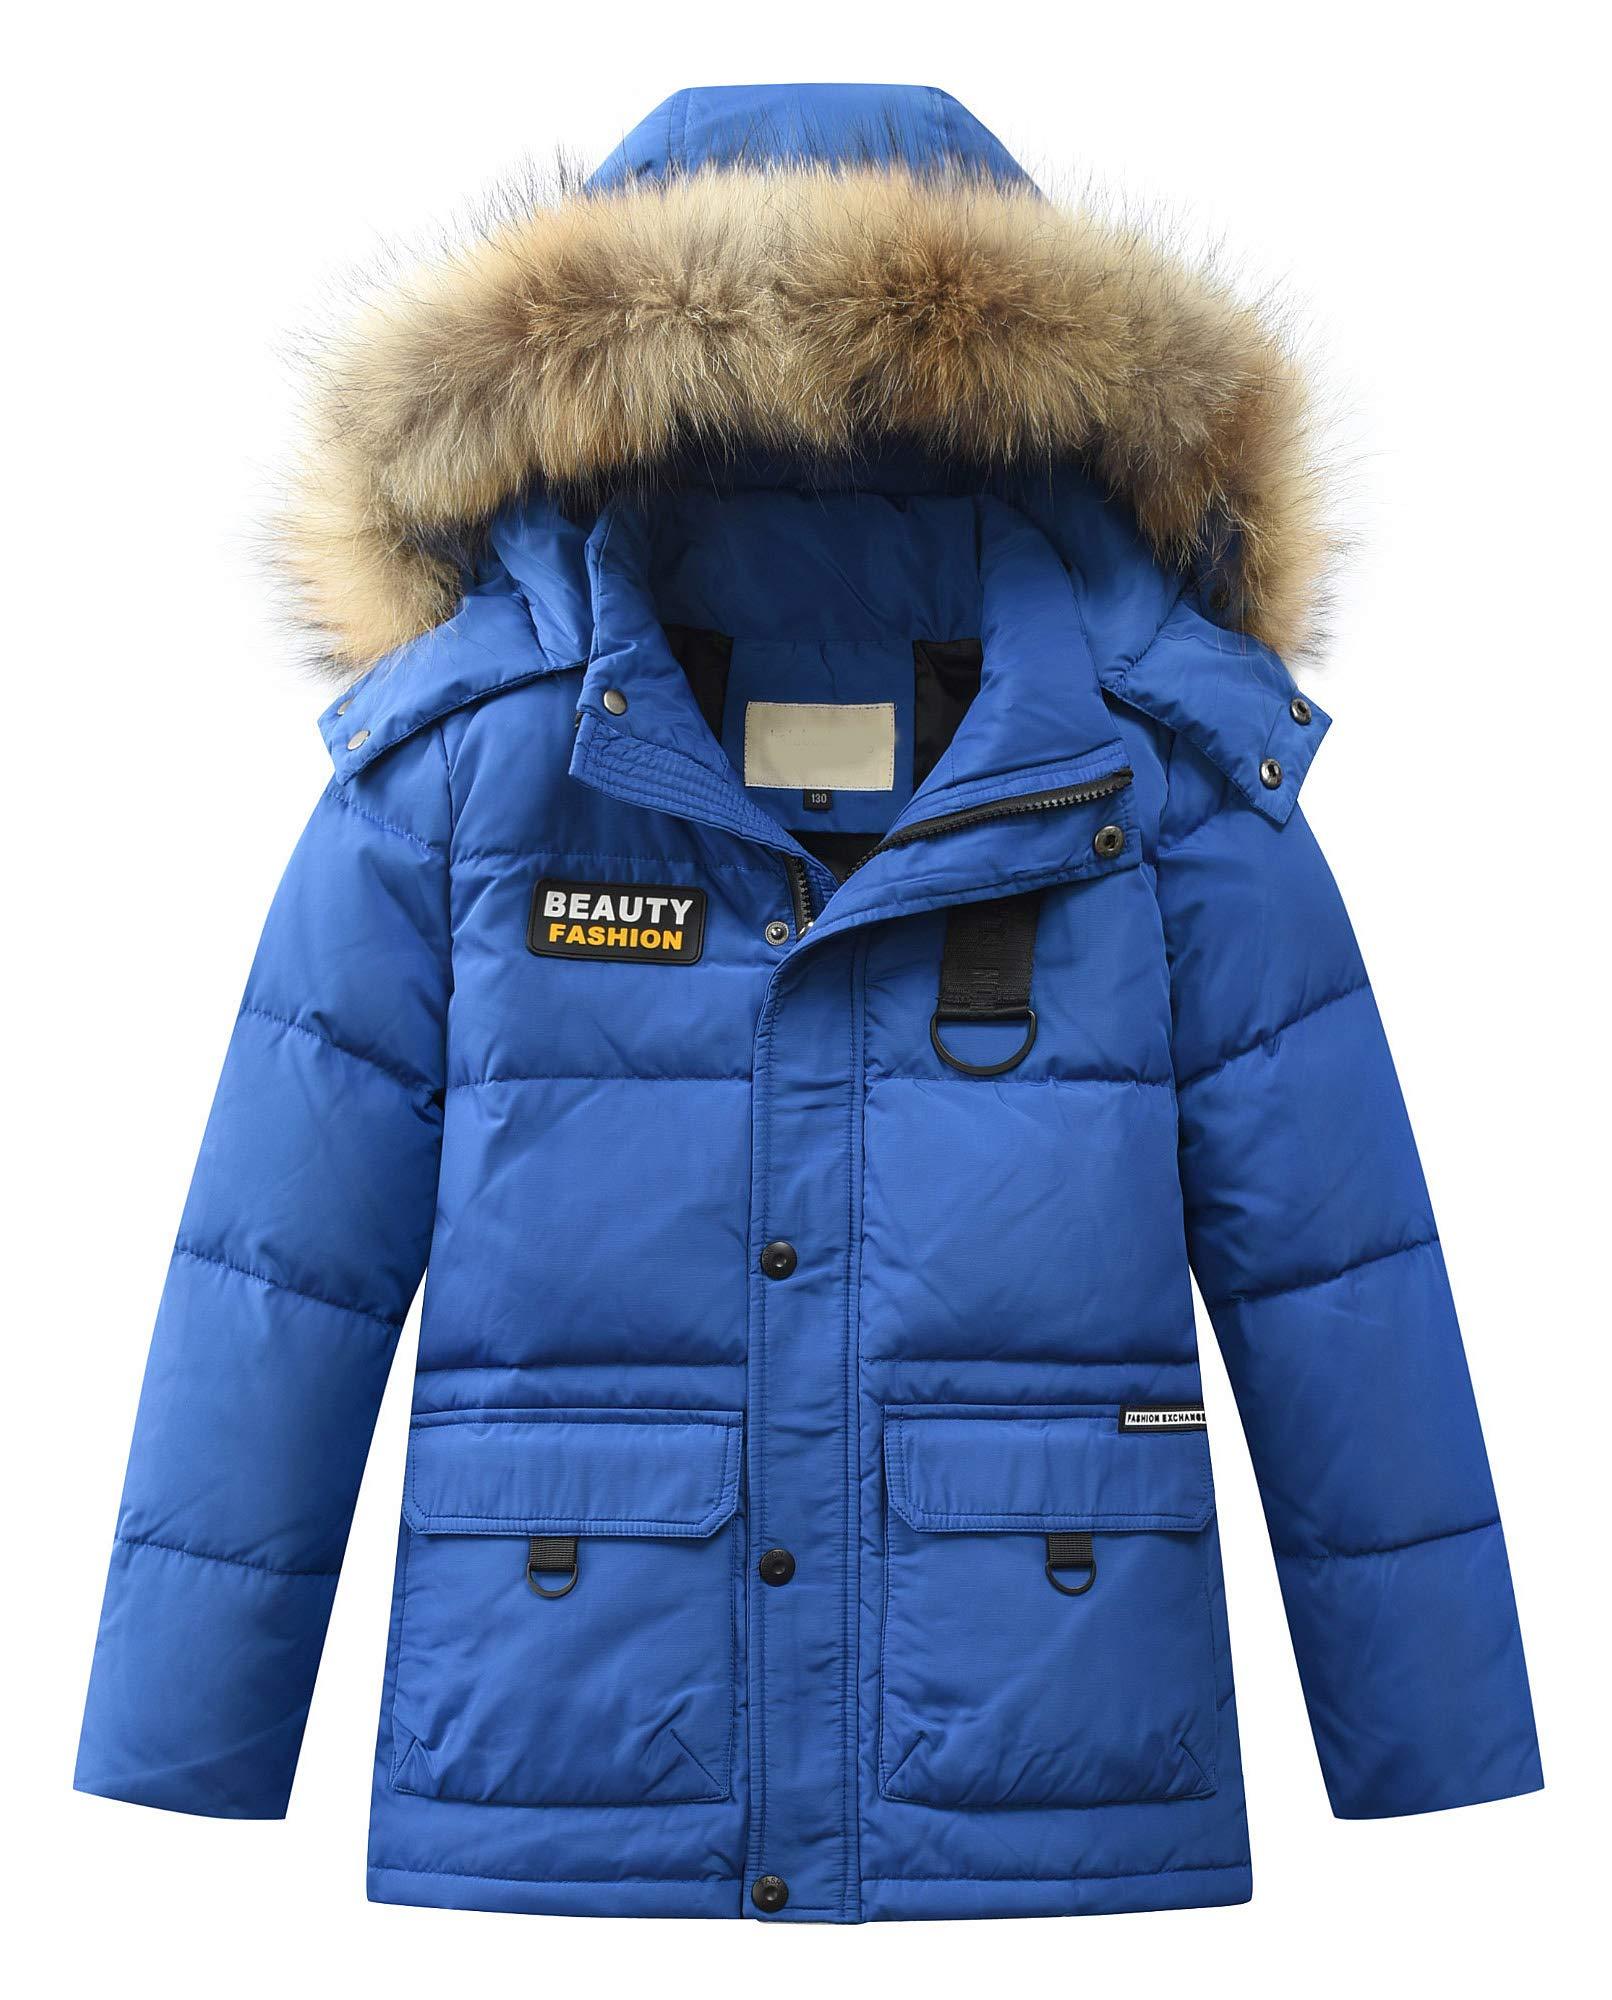 Mallimoda Big Boy's Hooded Bubble Jacket Heavyweight Solid Puffer Coat Style 4 Royal Blue 9-10 Years by Mallimoda